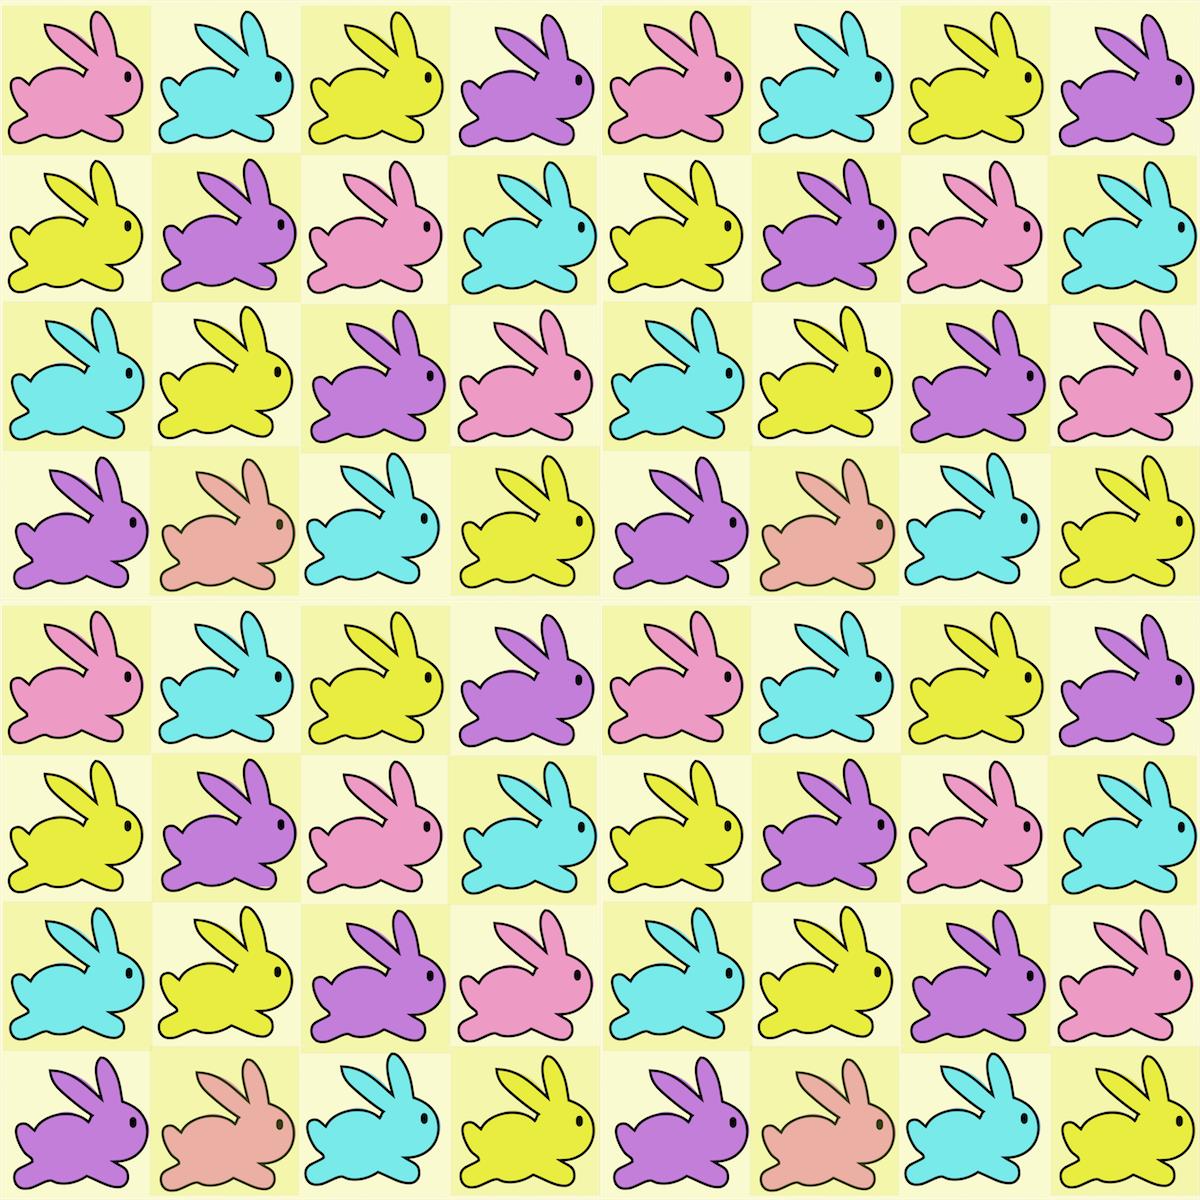 Free Digital Baby Bunny Scrapbooking Paper